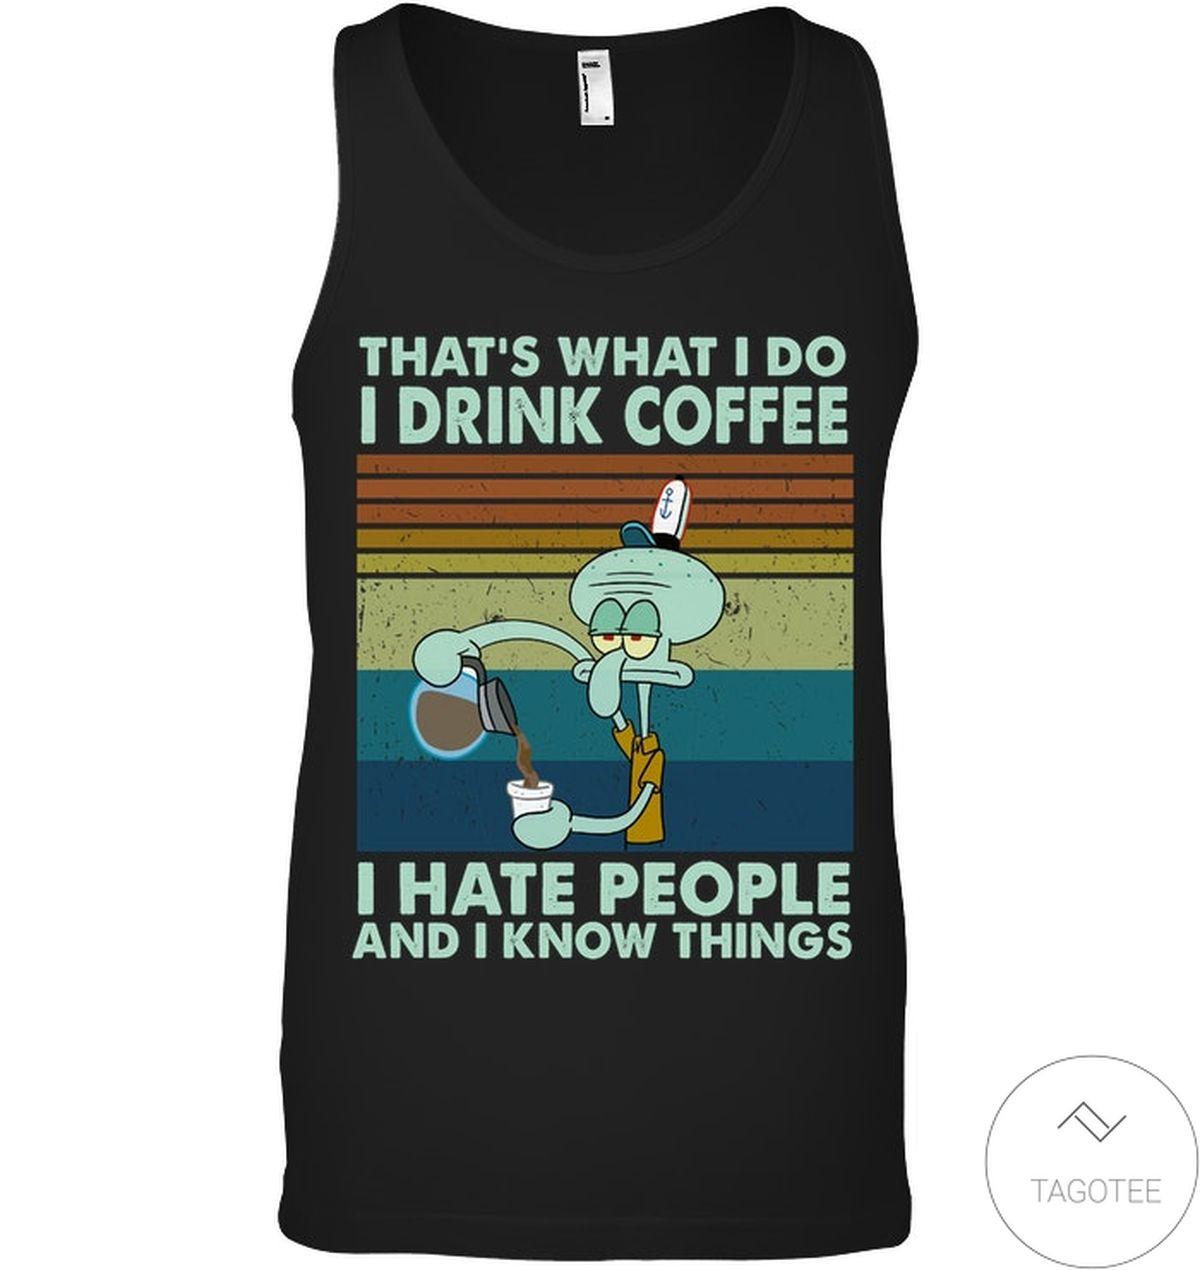 Top Rated Squidward Drink Coffee I Hate People Shirt, hoodie, tank top